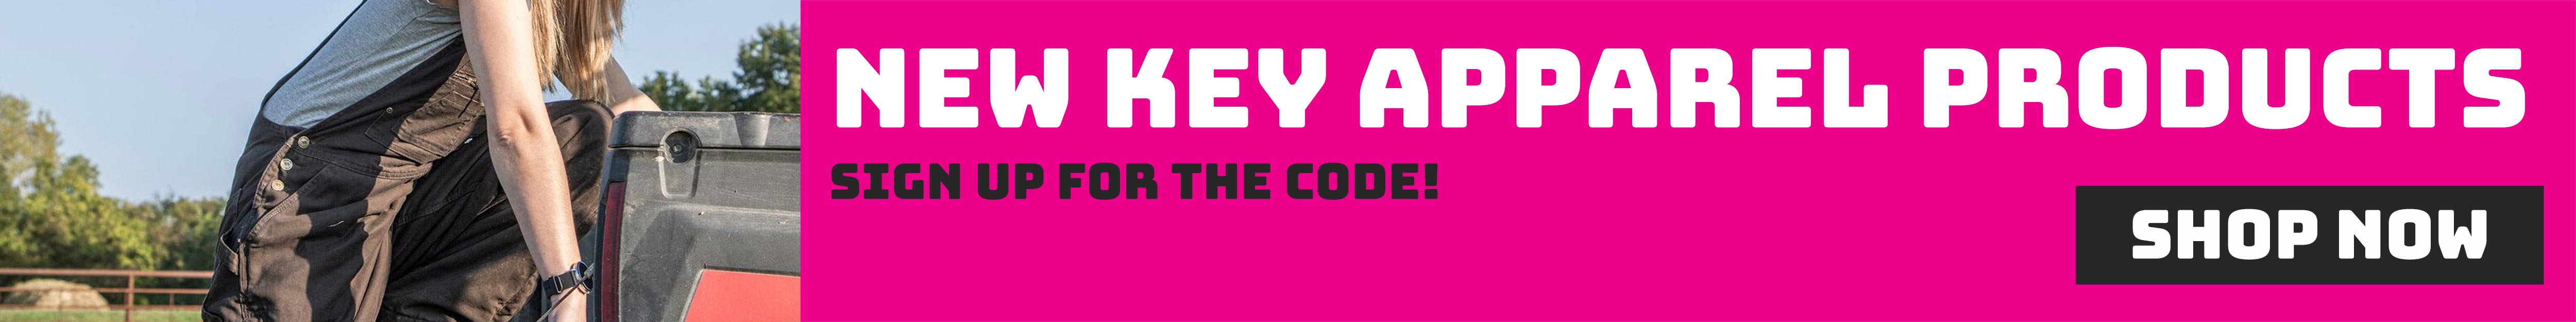 Shop Key Apparel Now!